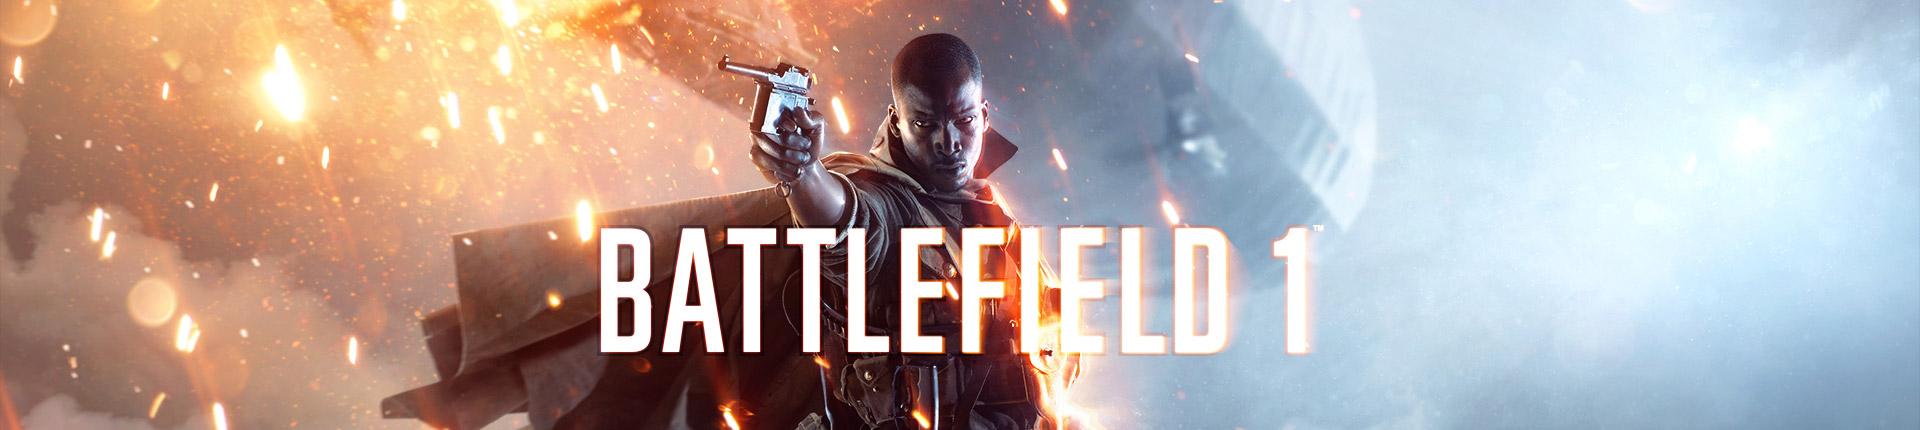 Battlefield1-430